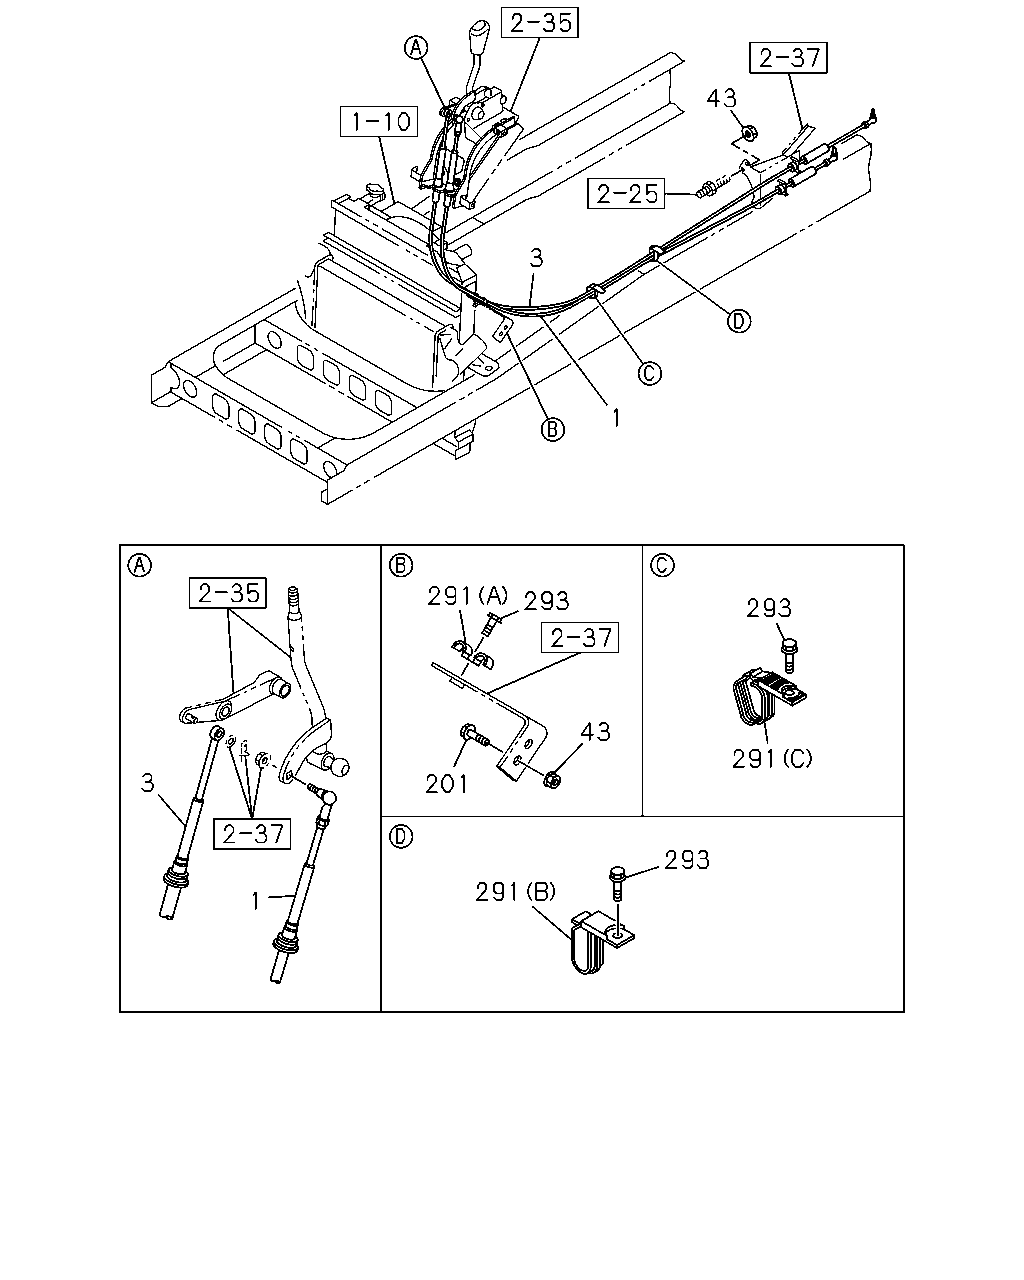 Mt 11738 Mt134 Lhd 16 2 Clutch Transmission Trans Axle Manual Diagram How Transmissions A Mtr6fb Leaf Suspension